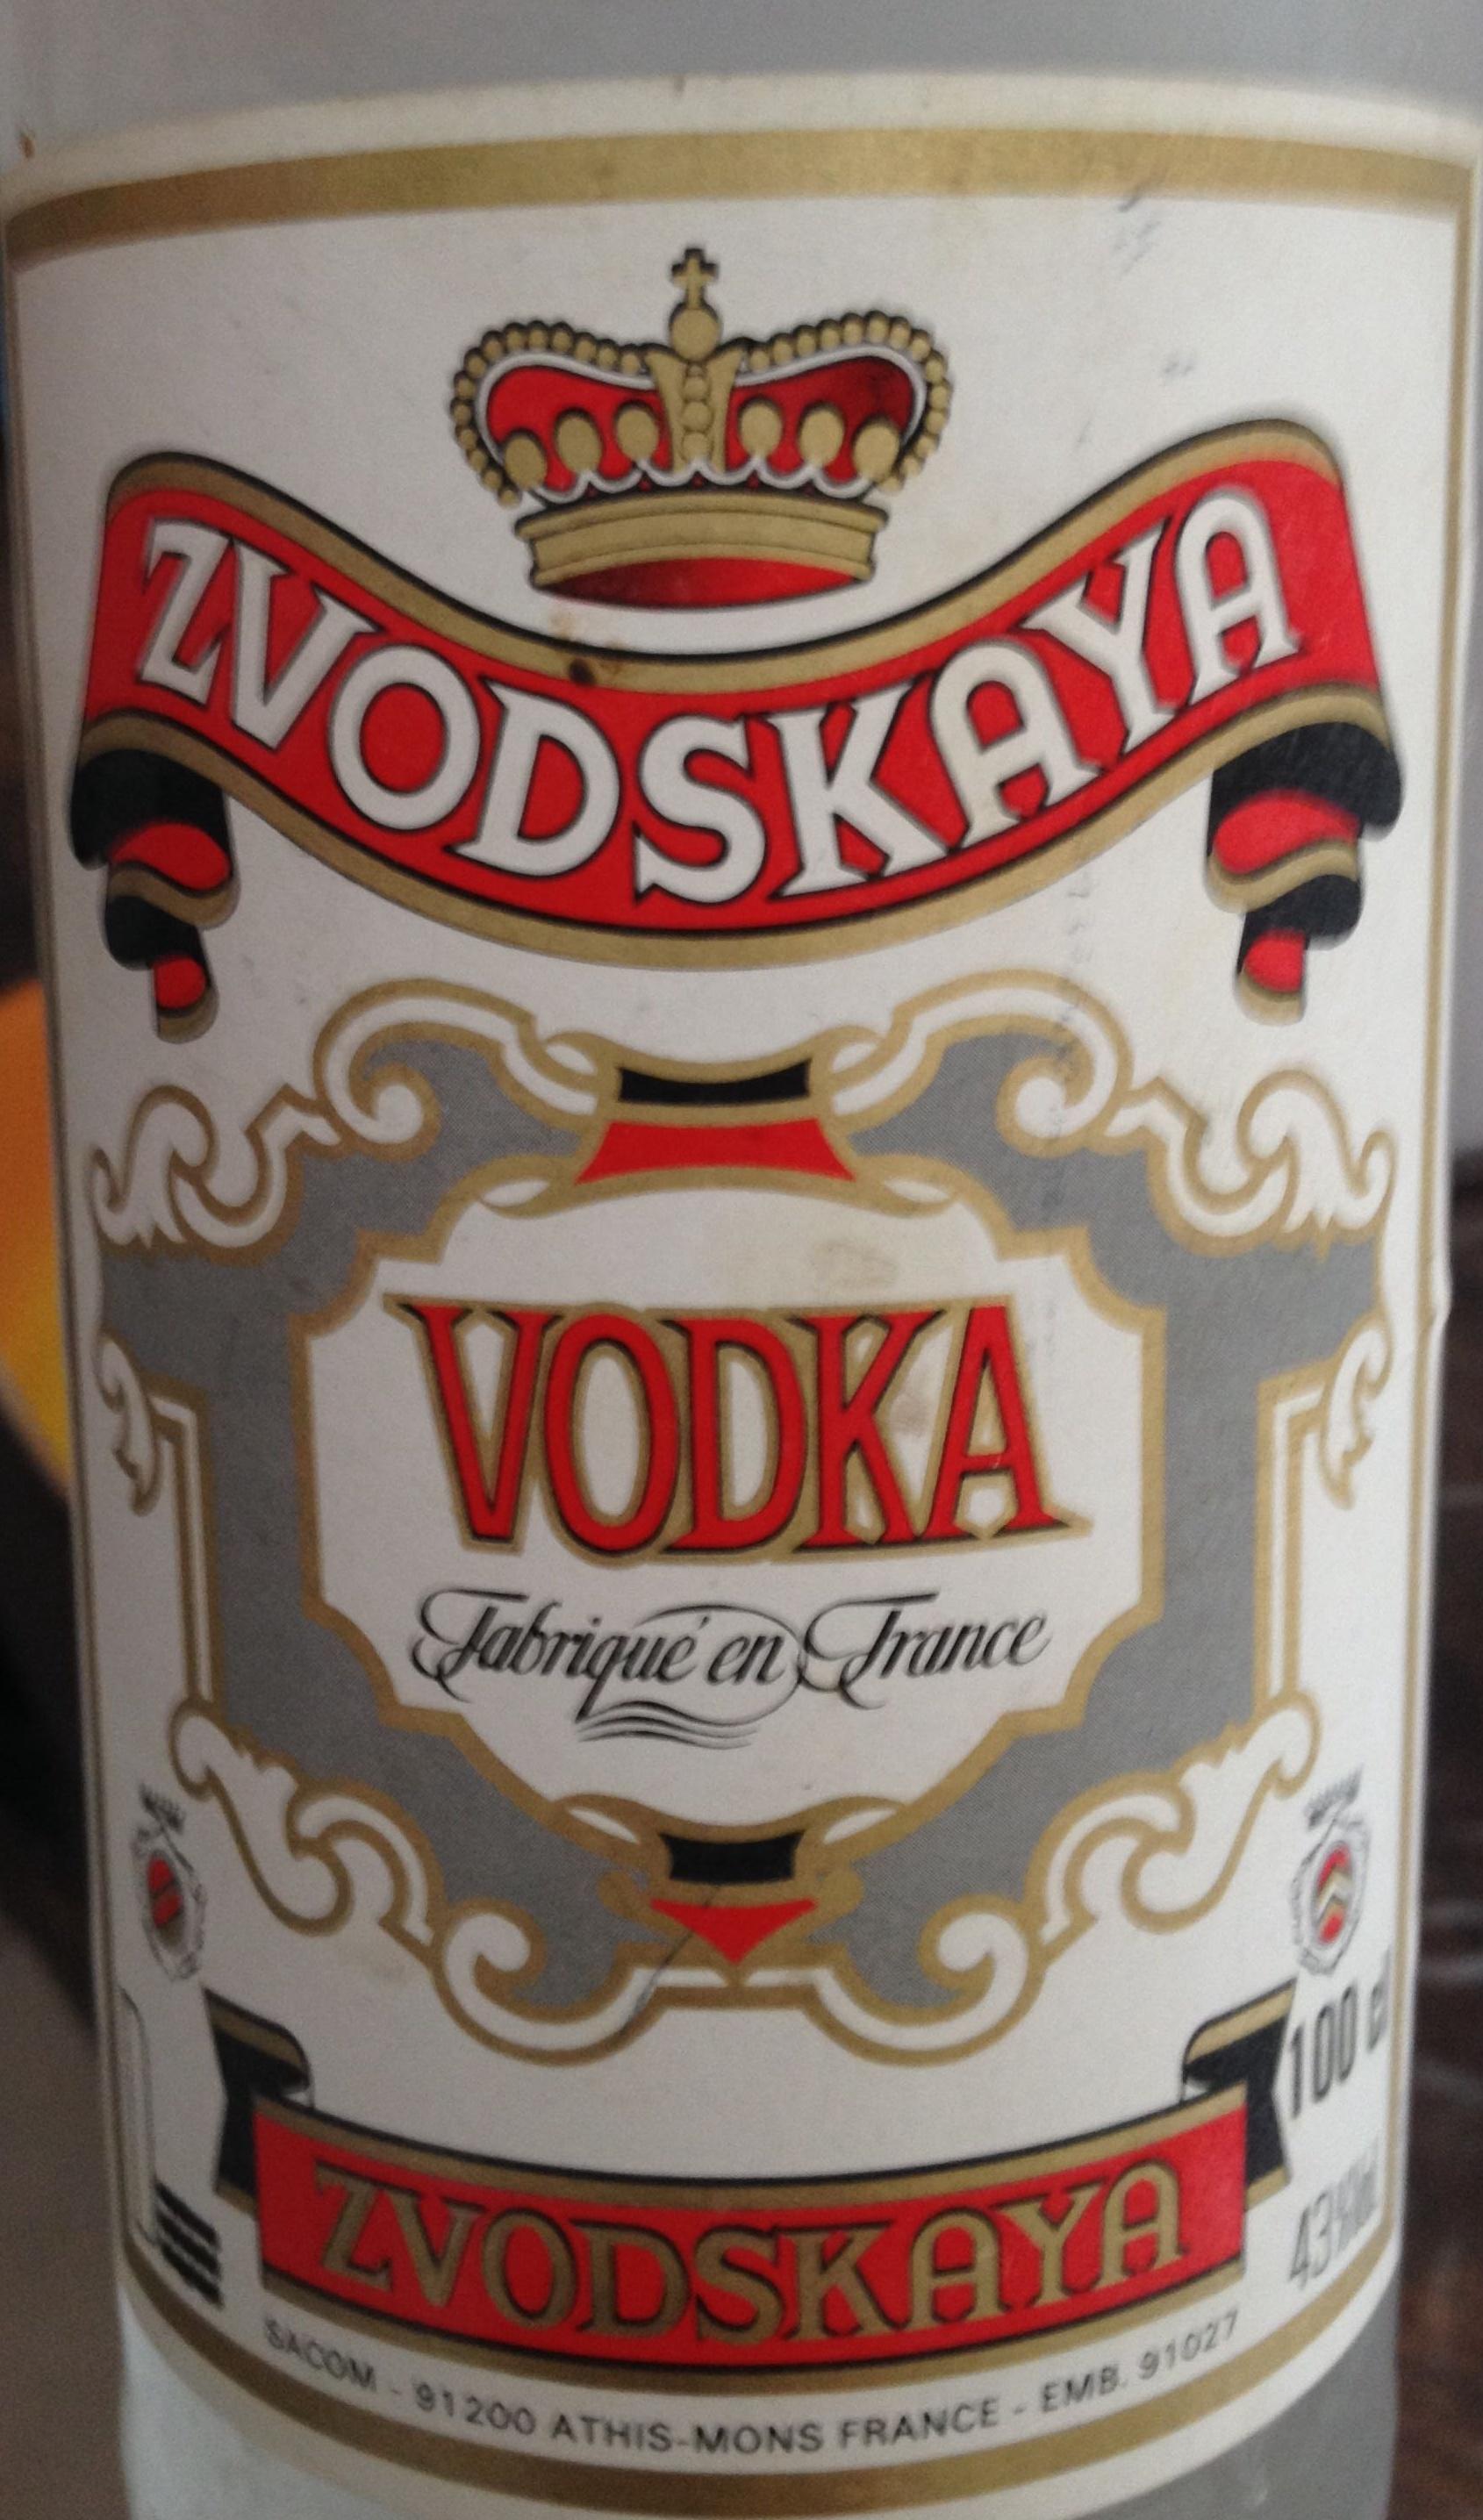 Vodka - Product - fr